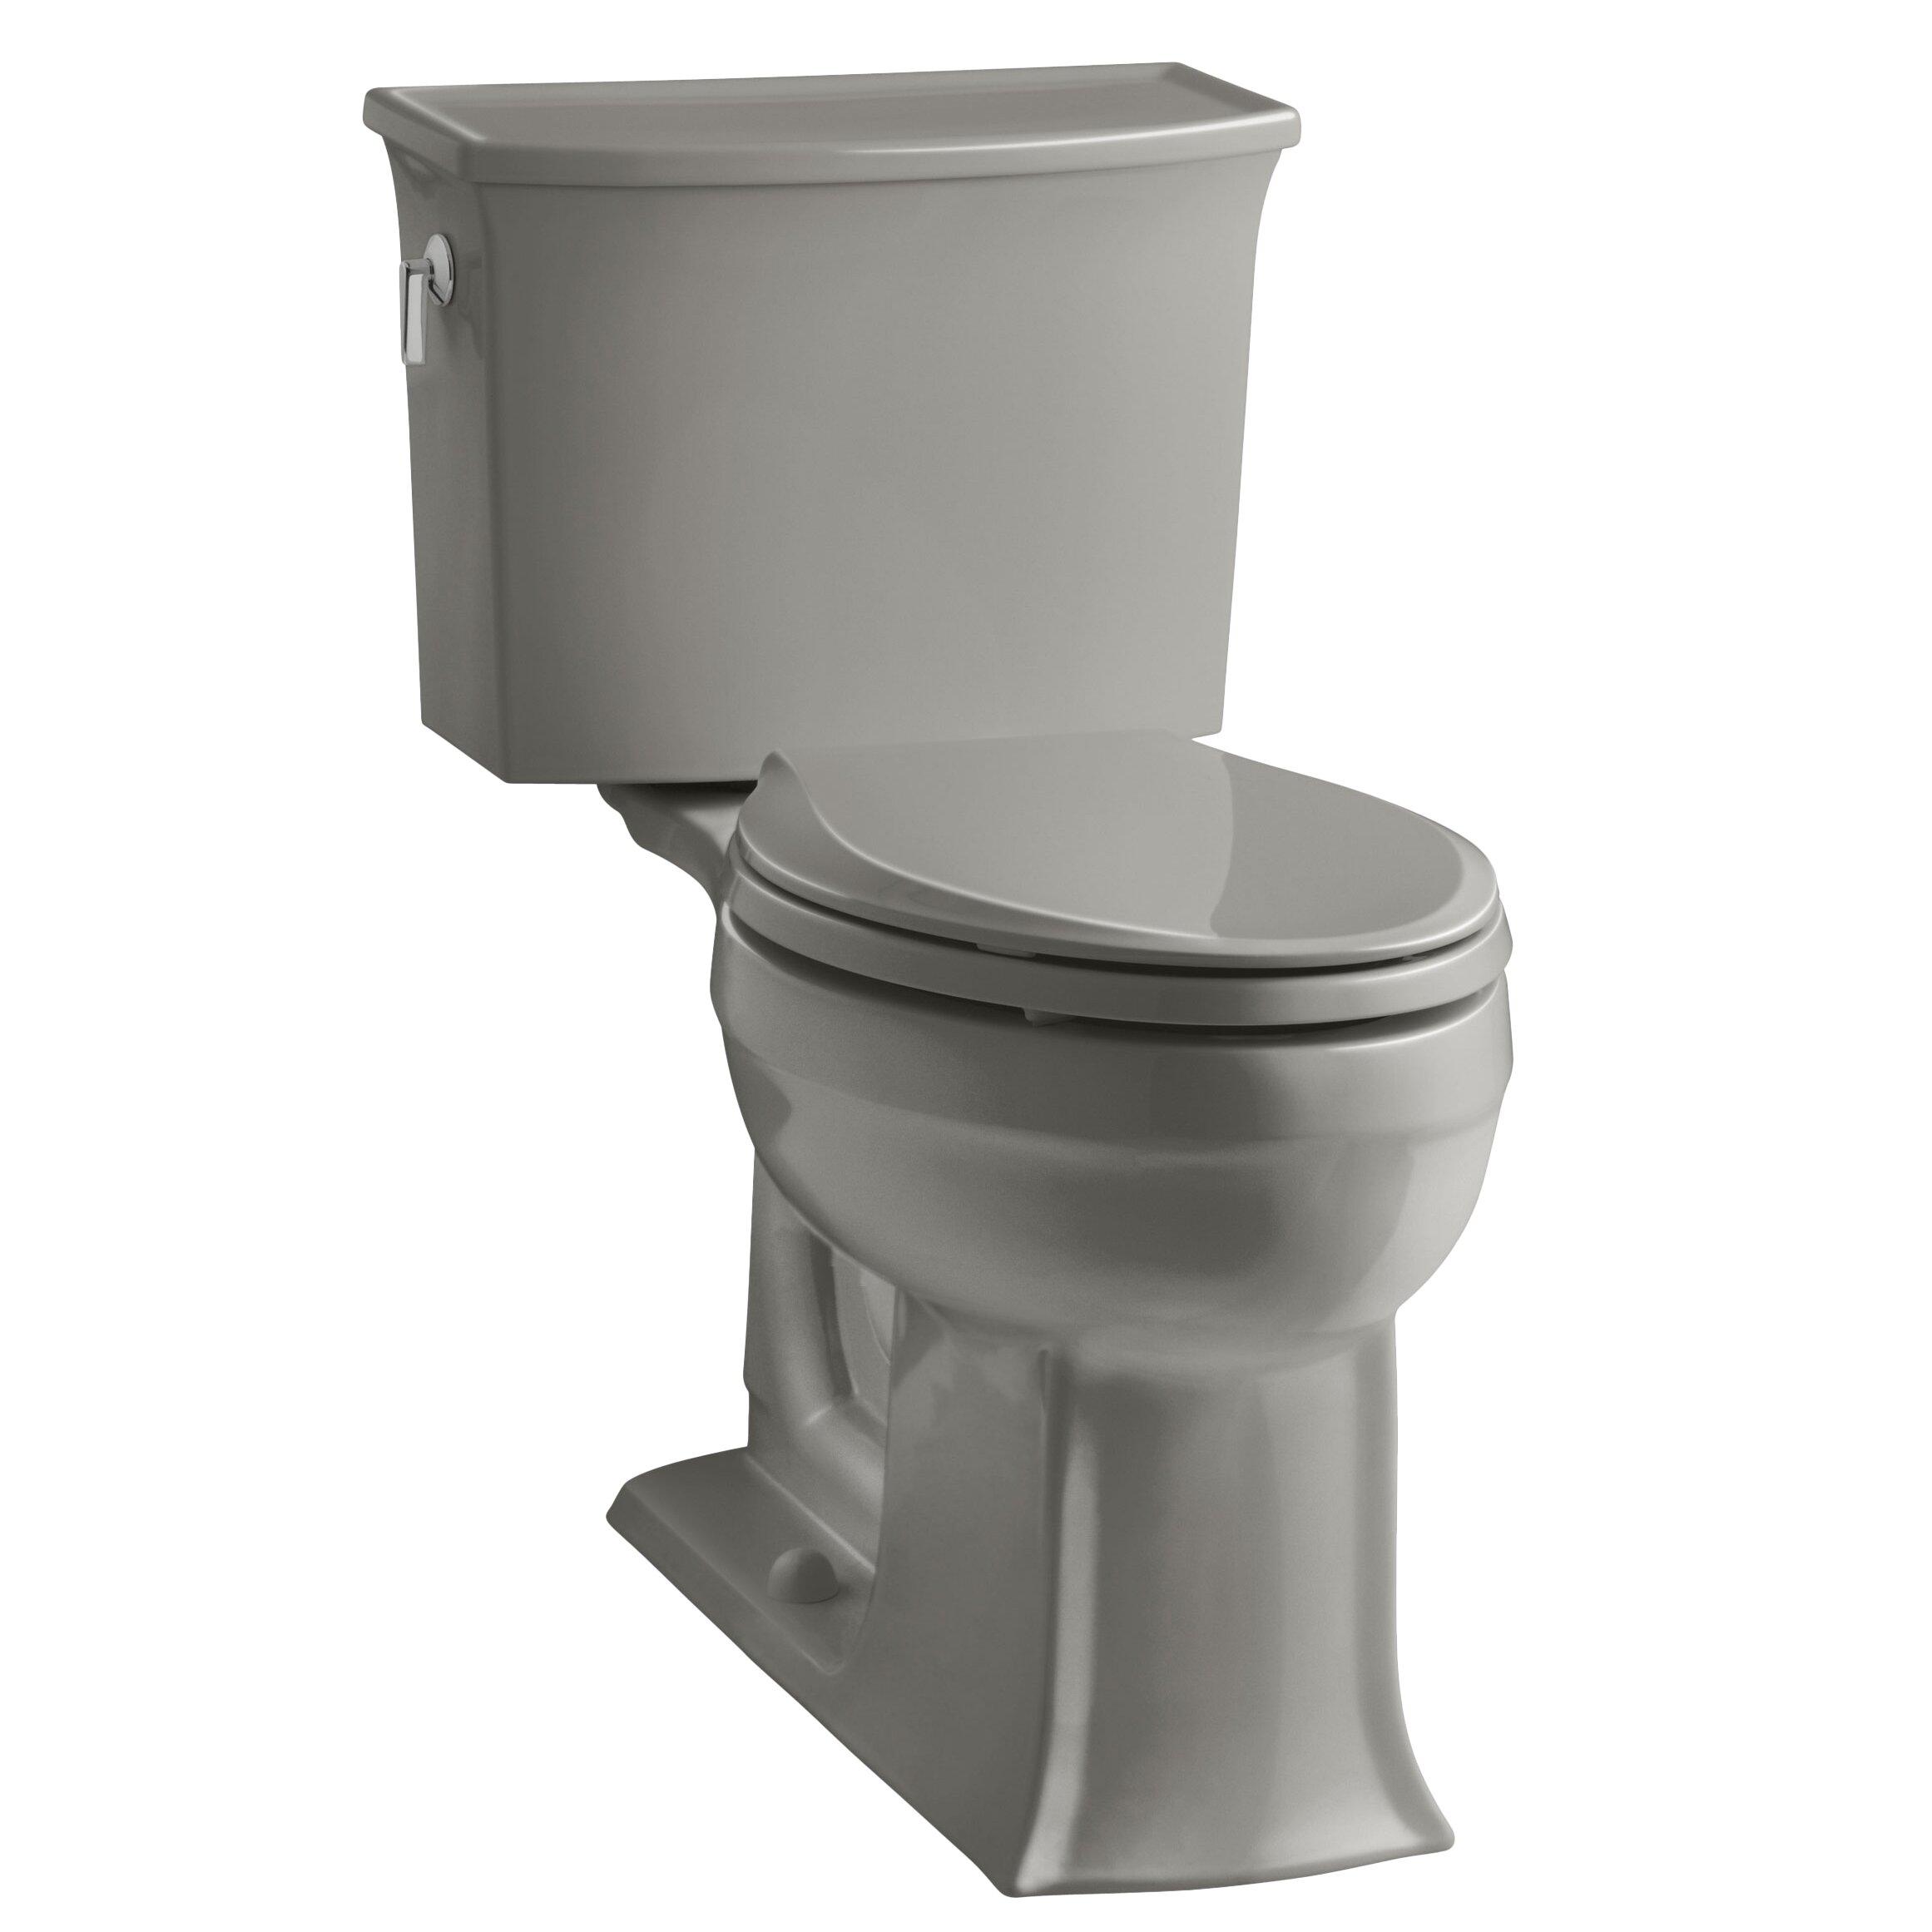 Kohler Archer 2 Piece Elongated Toilet With Aquapiston